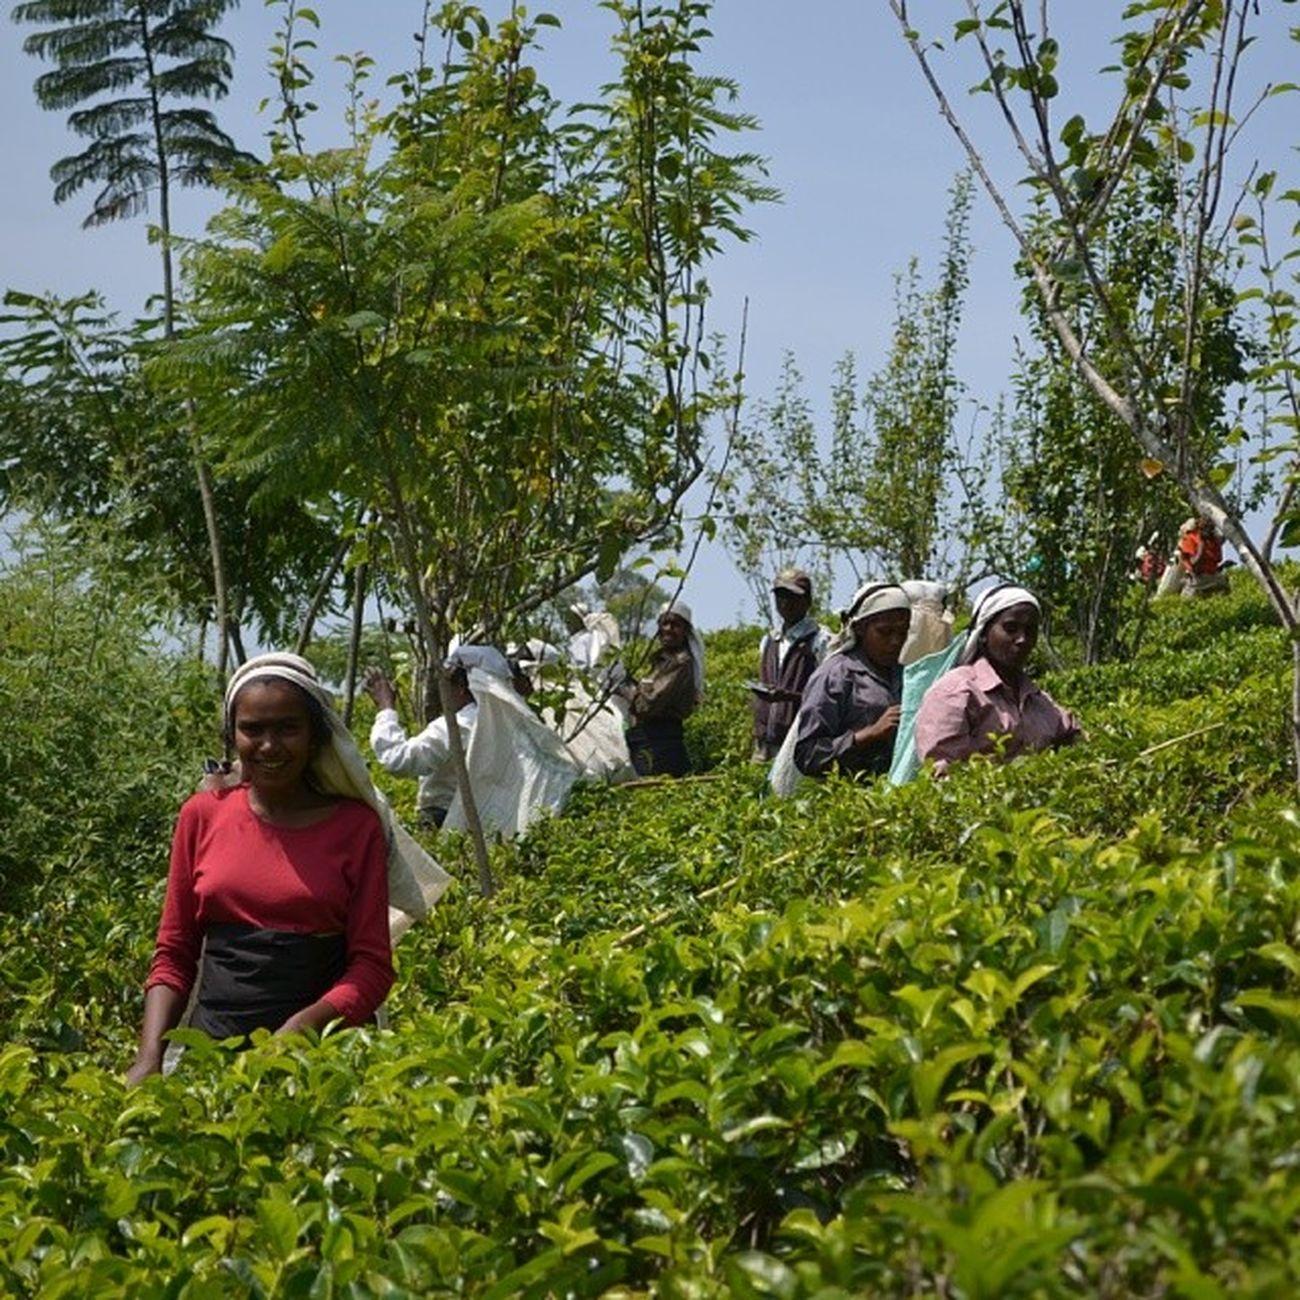 Tea leaf picking in Sri Lanka Iamsrilanka EarthInstagram Allshots_ SriLanka srilankatailormade tea ceylon ceylontea thotalagala